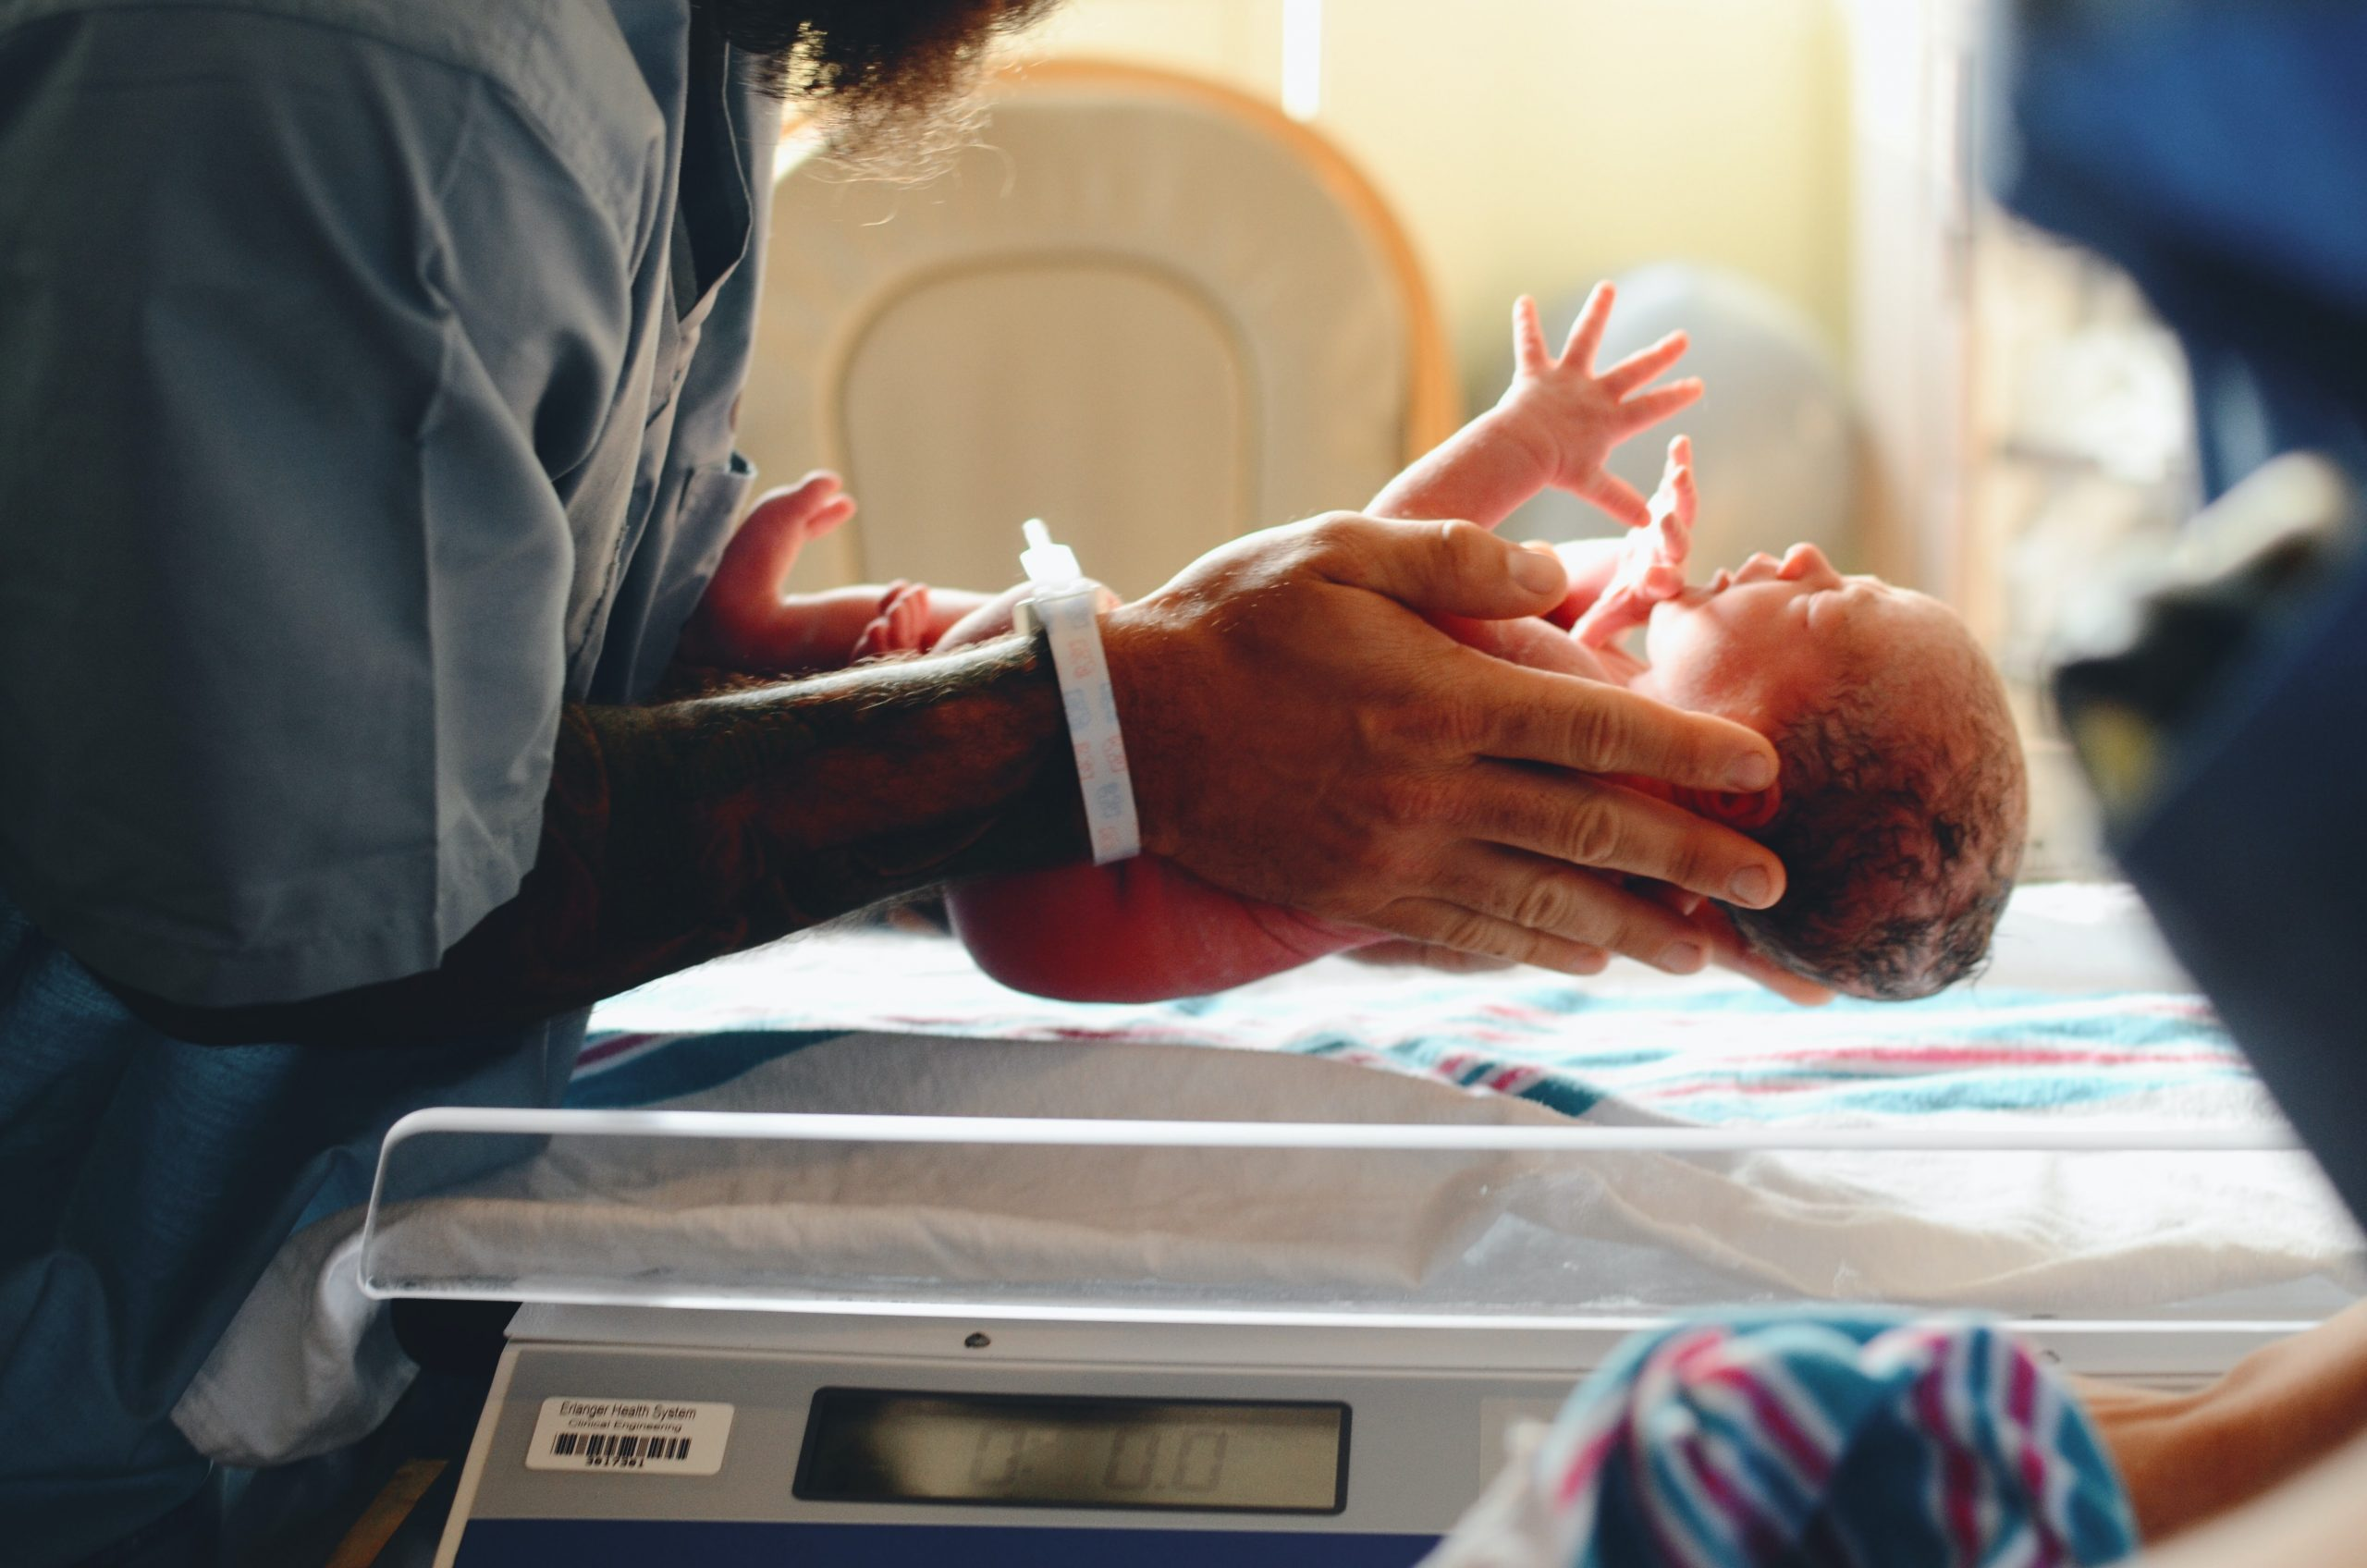 Zwangerschap - mamabloggers - forum - de bevalling